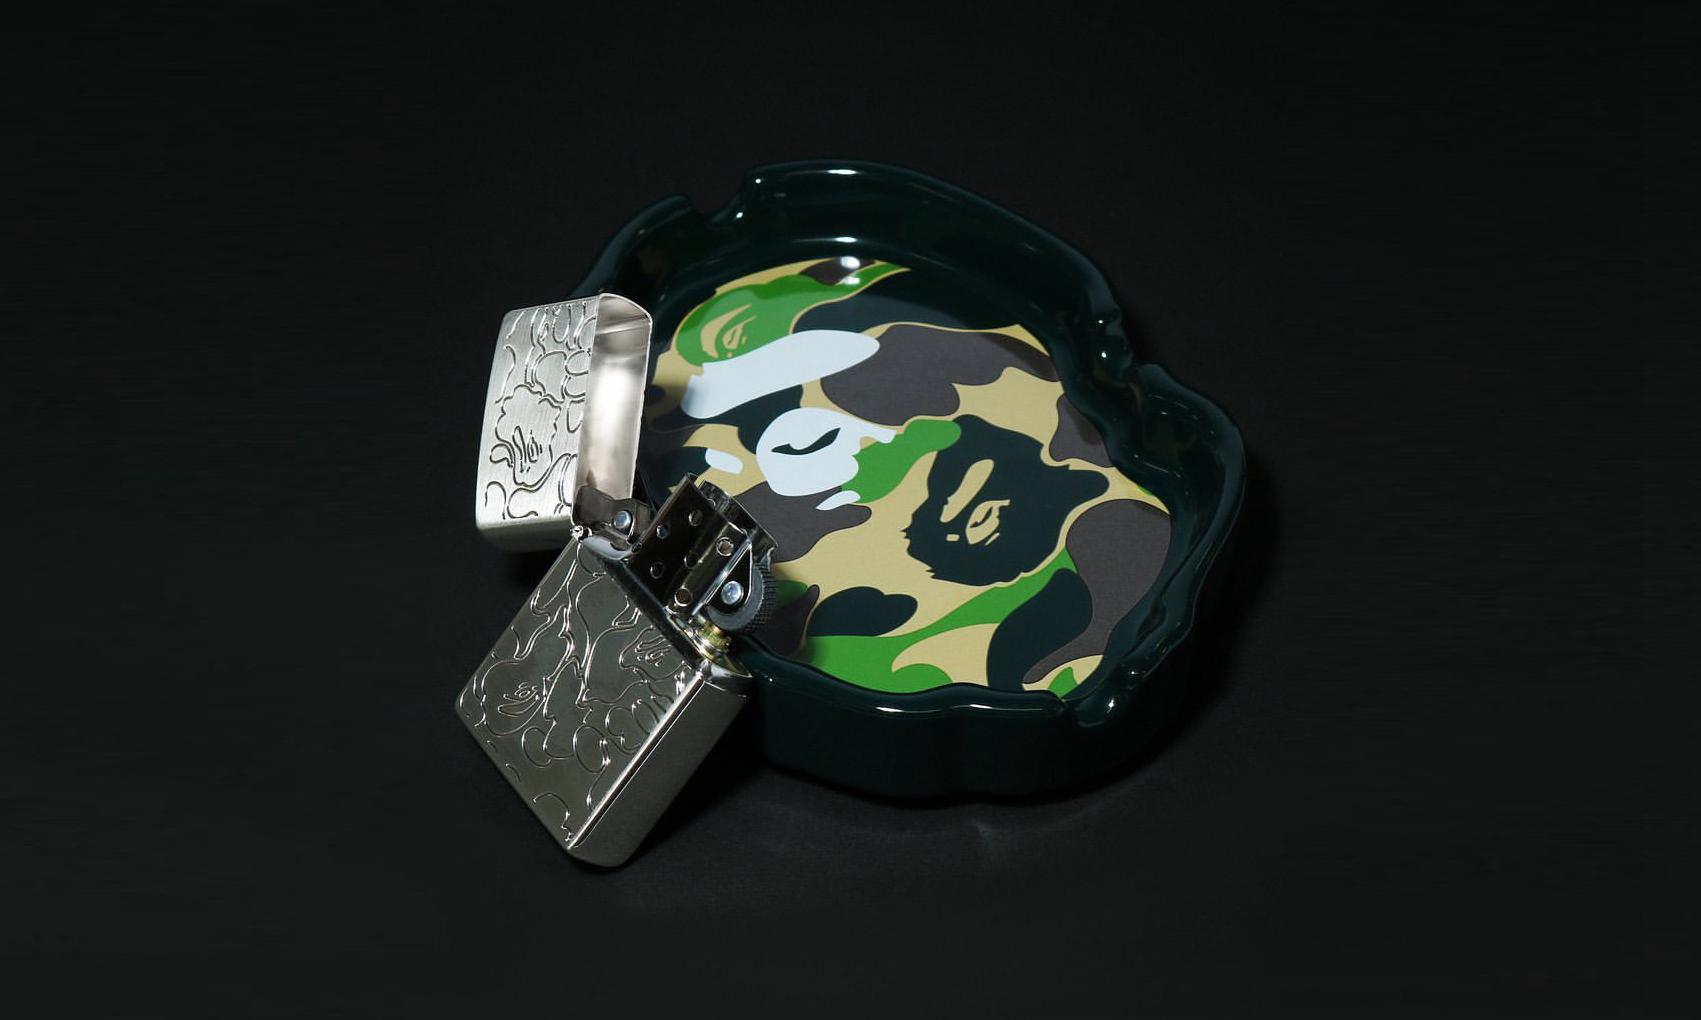 ZIPPO x A BATHING APE® 合作系列登场